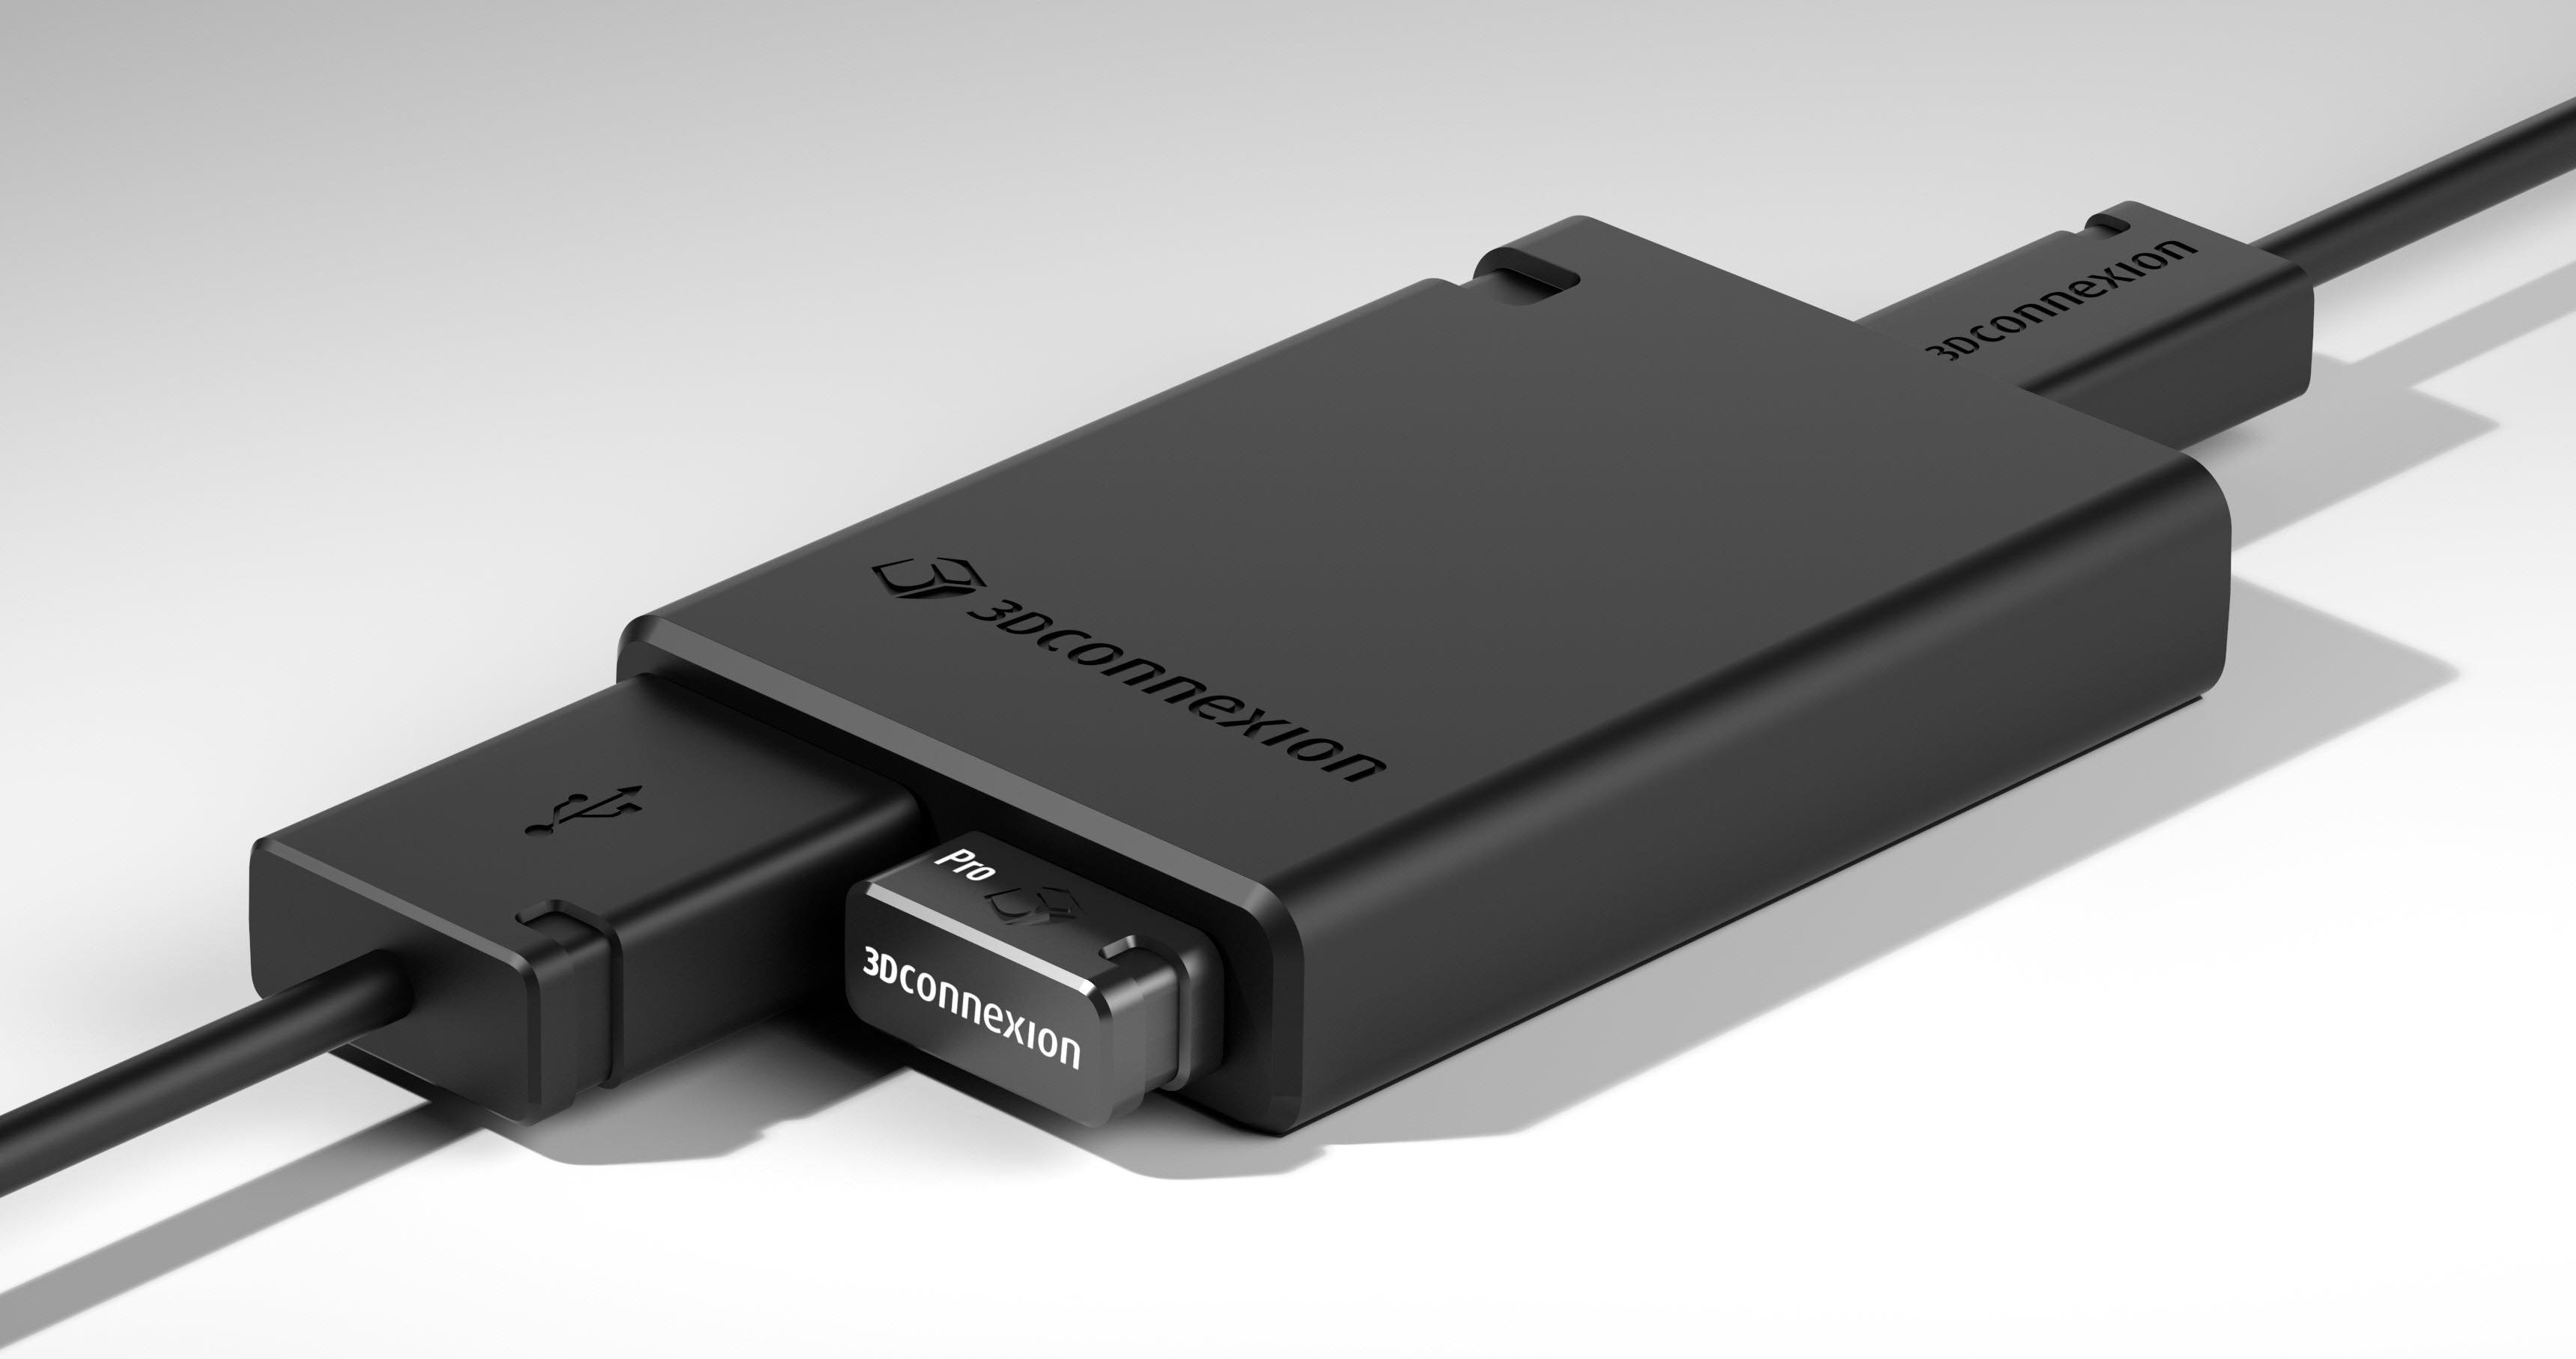 3Dconnexion USB Hub Right Iso Receiver